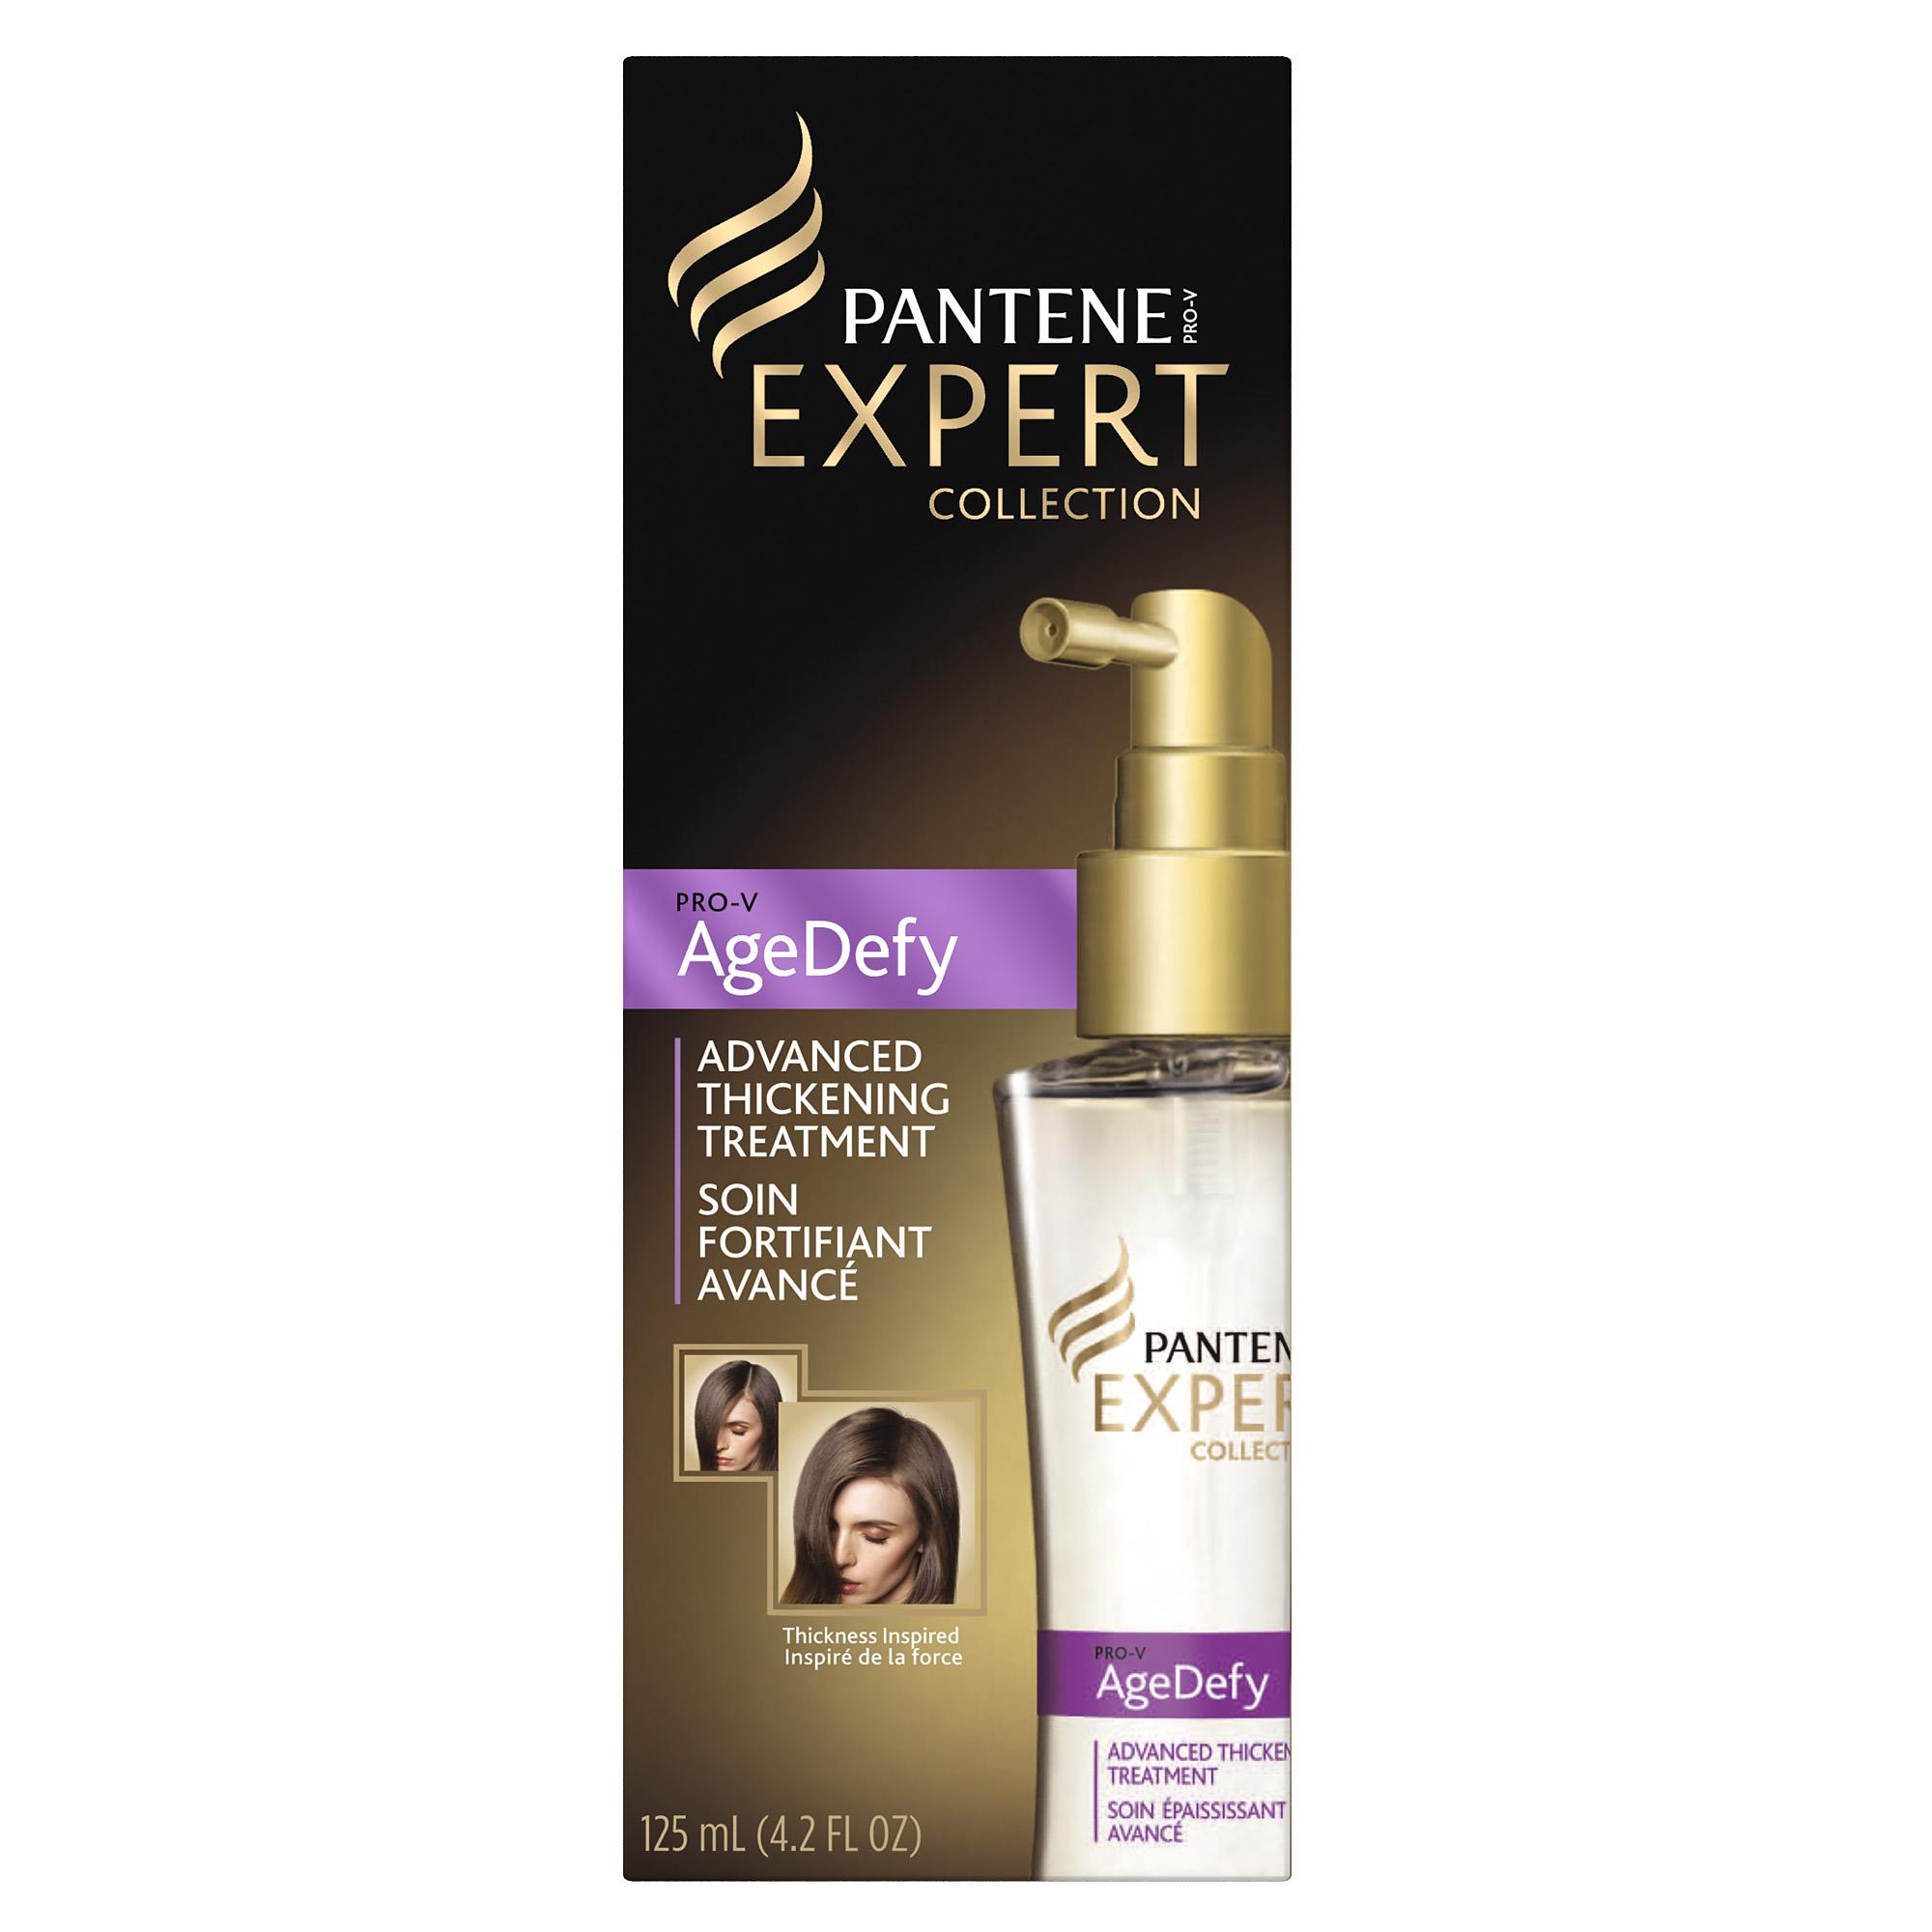 Pantene Pro-V Expert Collection AgeDefy Advanced Hair Thickening Treatment 4.2 Fl Oz